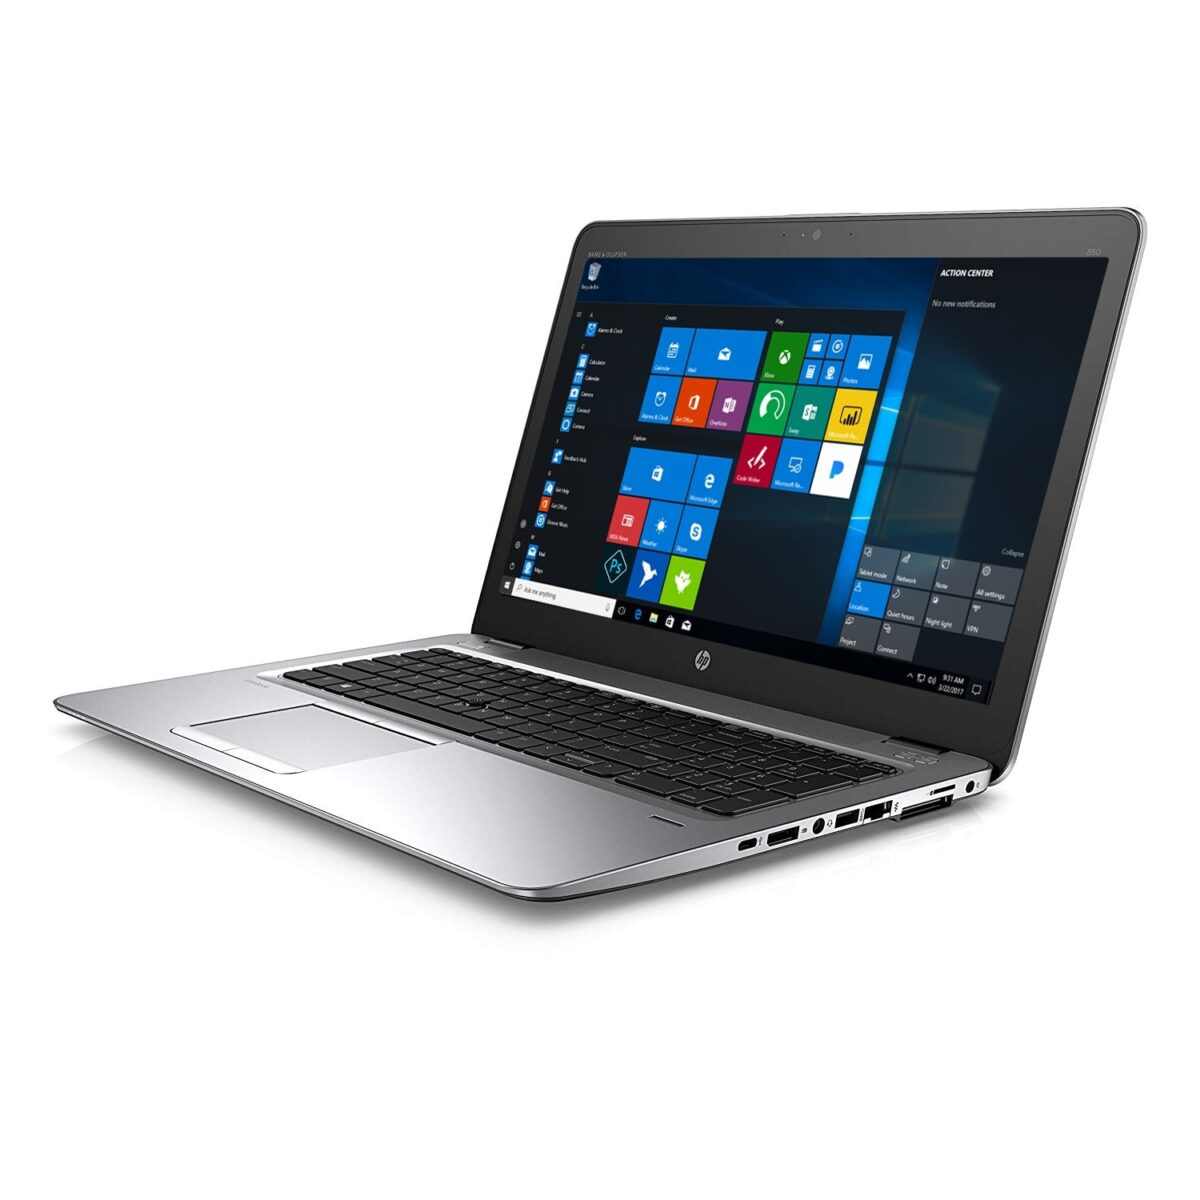 "HP Laptop 15.6"" Elitebook 850 G3 256GB SSD 16GB Powerful Core i5 Windows 10 Pro Sale"